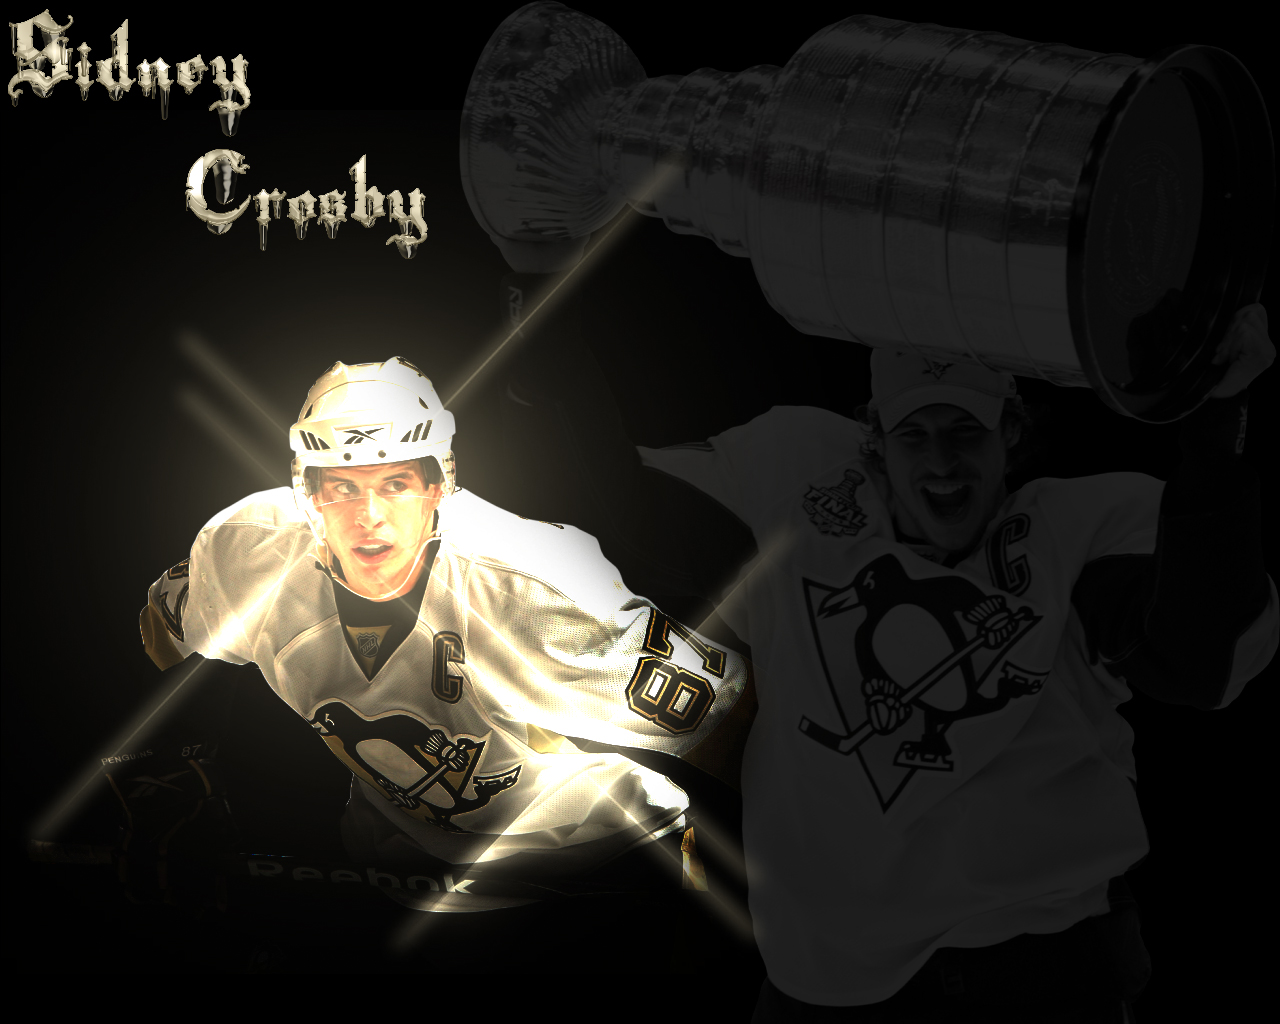 Sidney Crosby Winter Classic Wallpaper Kaito42s 1280x1024